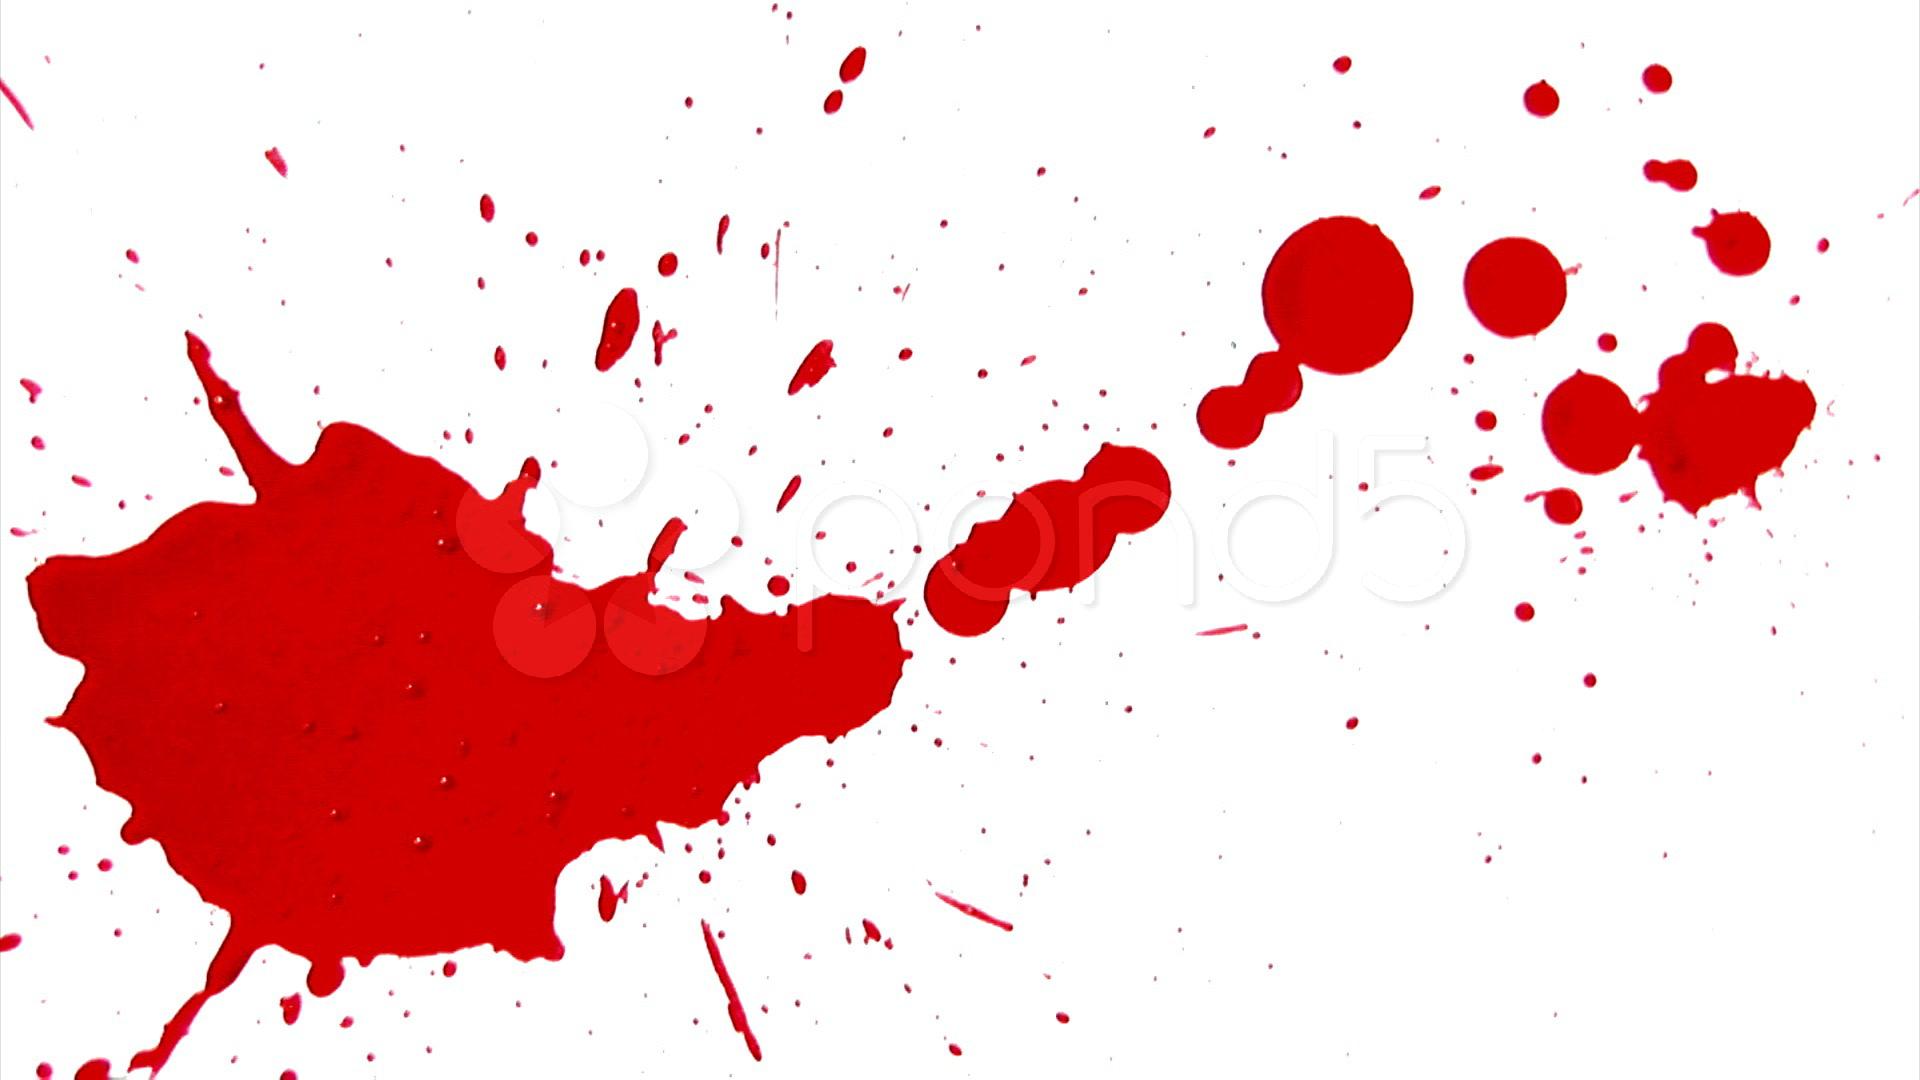 Blood Splatter Animation Clipart Best-Blood Splatter Animation Clipart Best-5